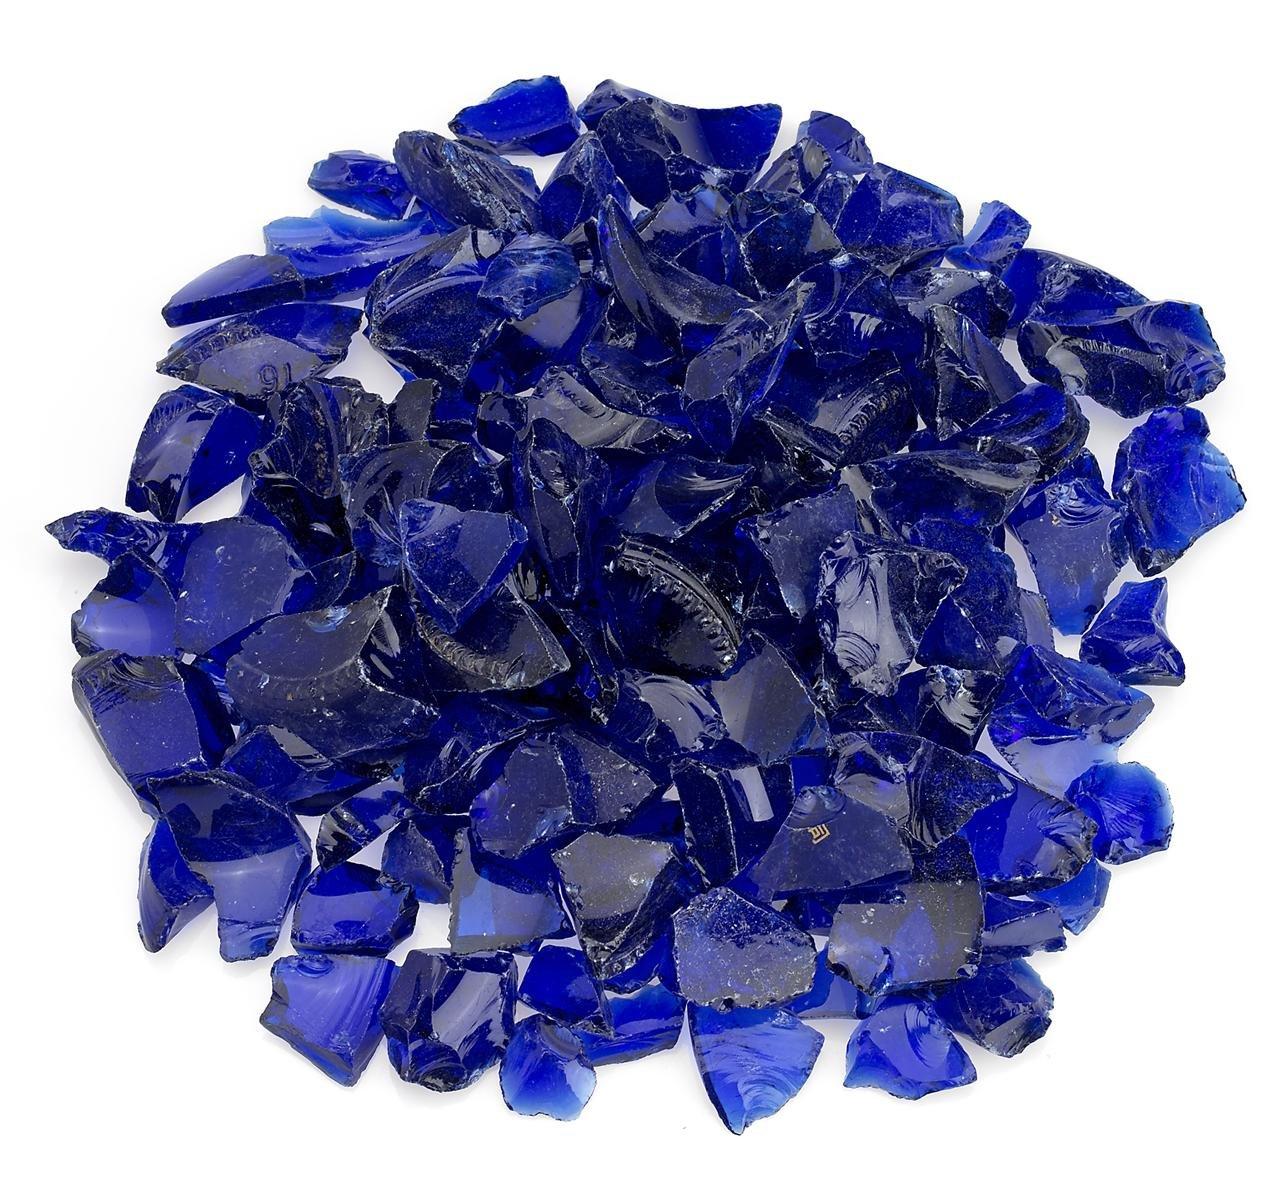 American Fireglass Dark Blue Recycled Fire Pit Glass - Medium (18-28Mm), 10 lb. Bag